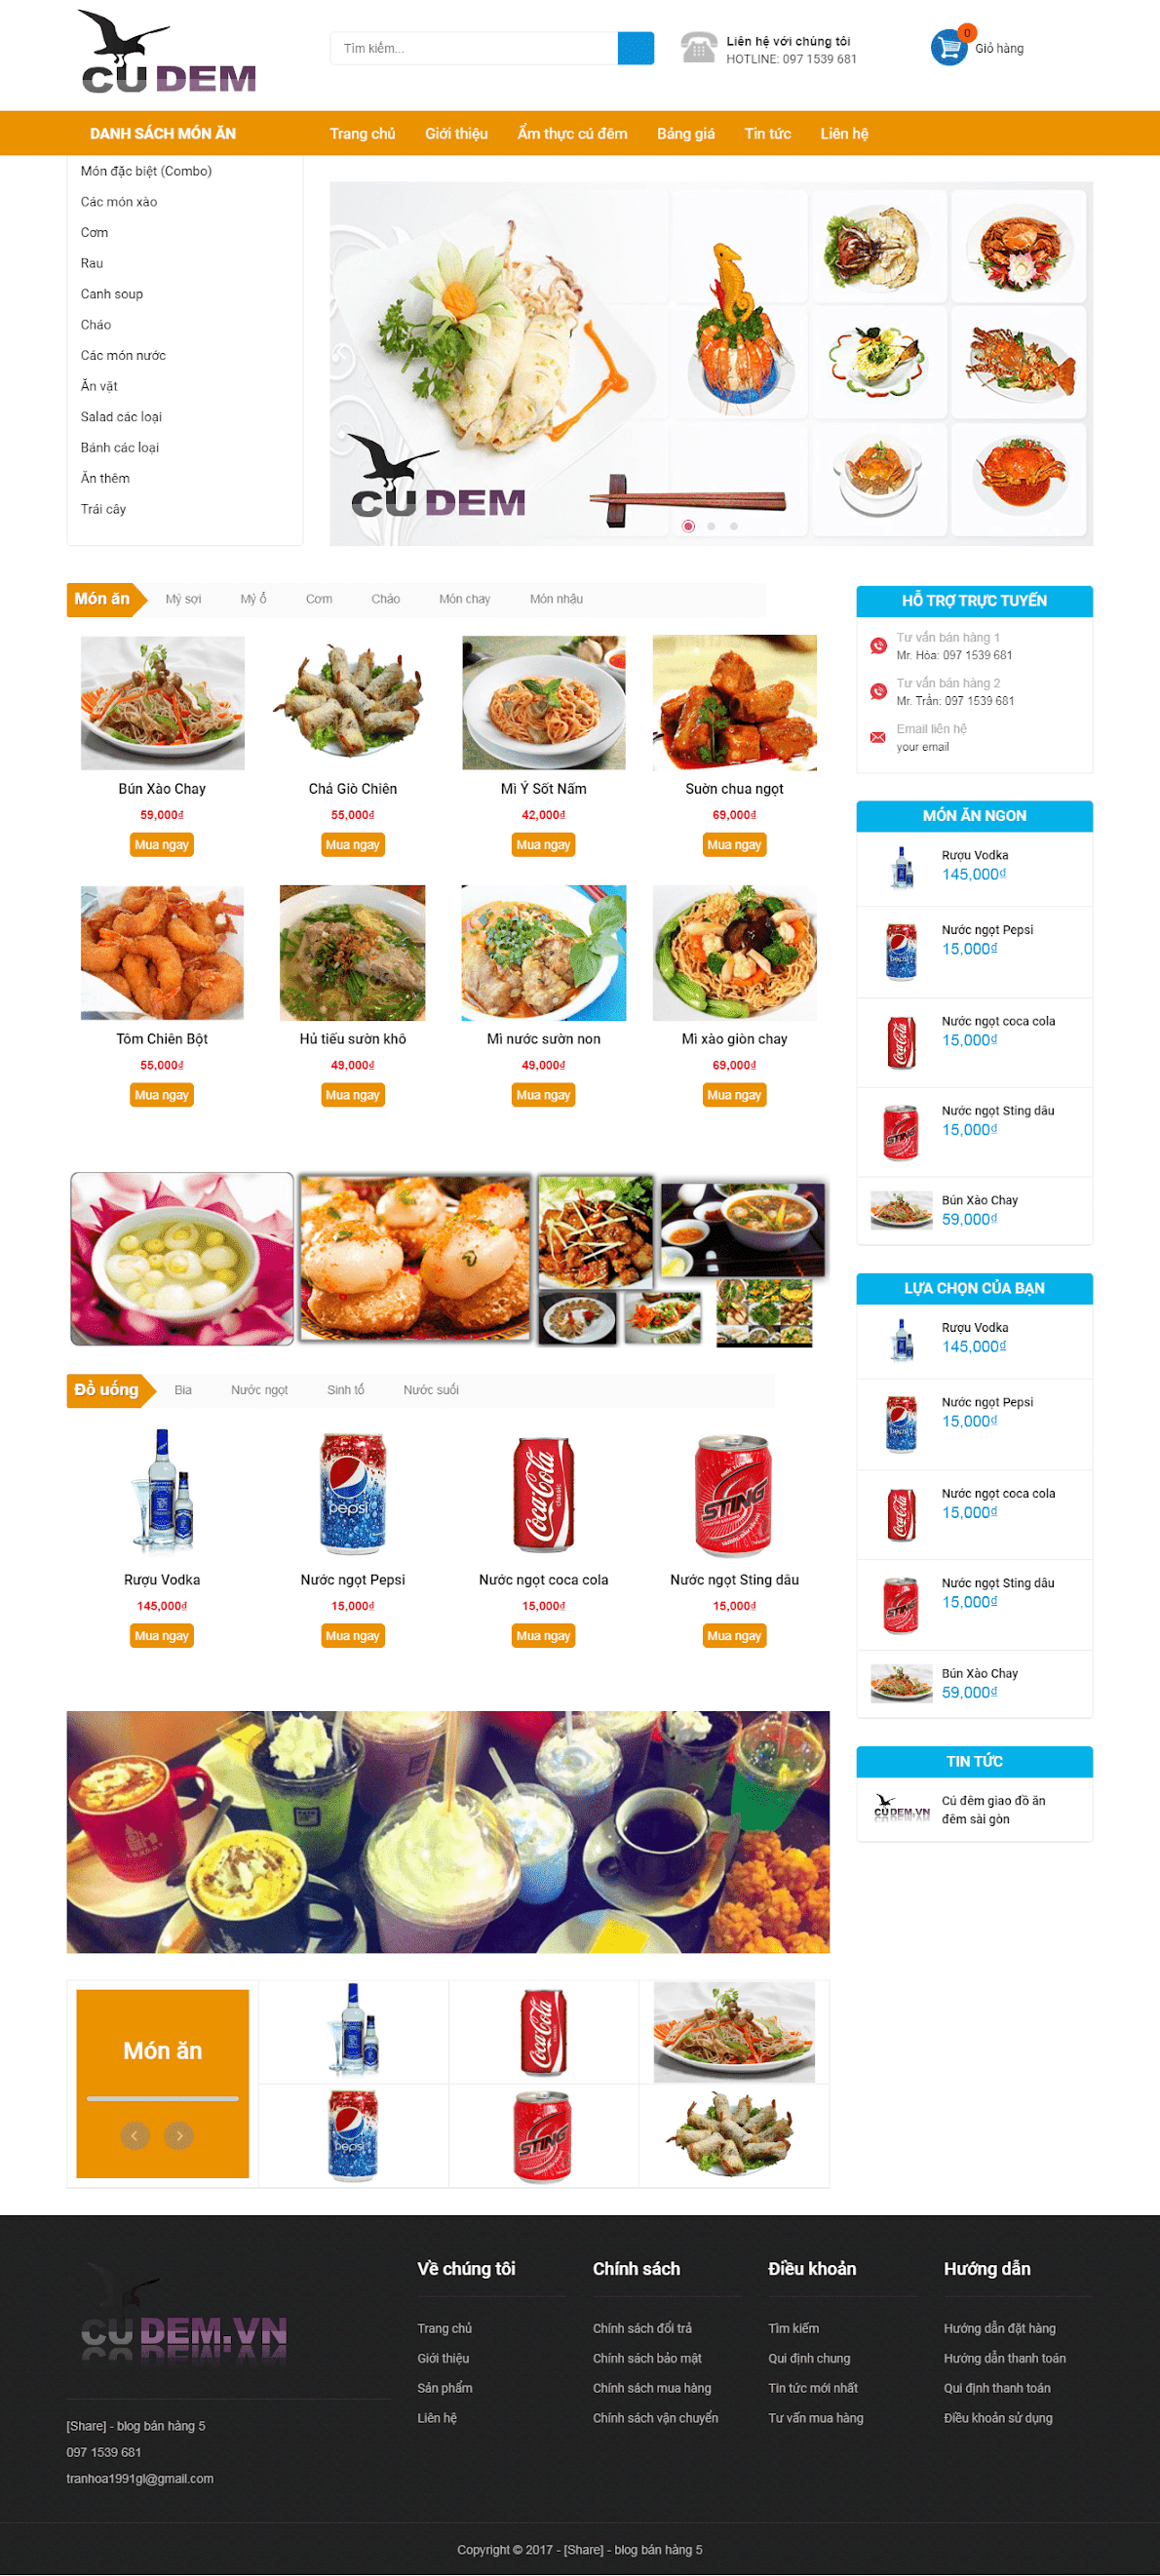 Template blogspot kinh doanh đồ ăn vặt